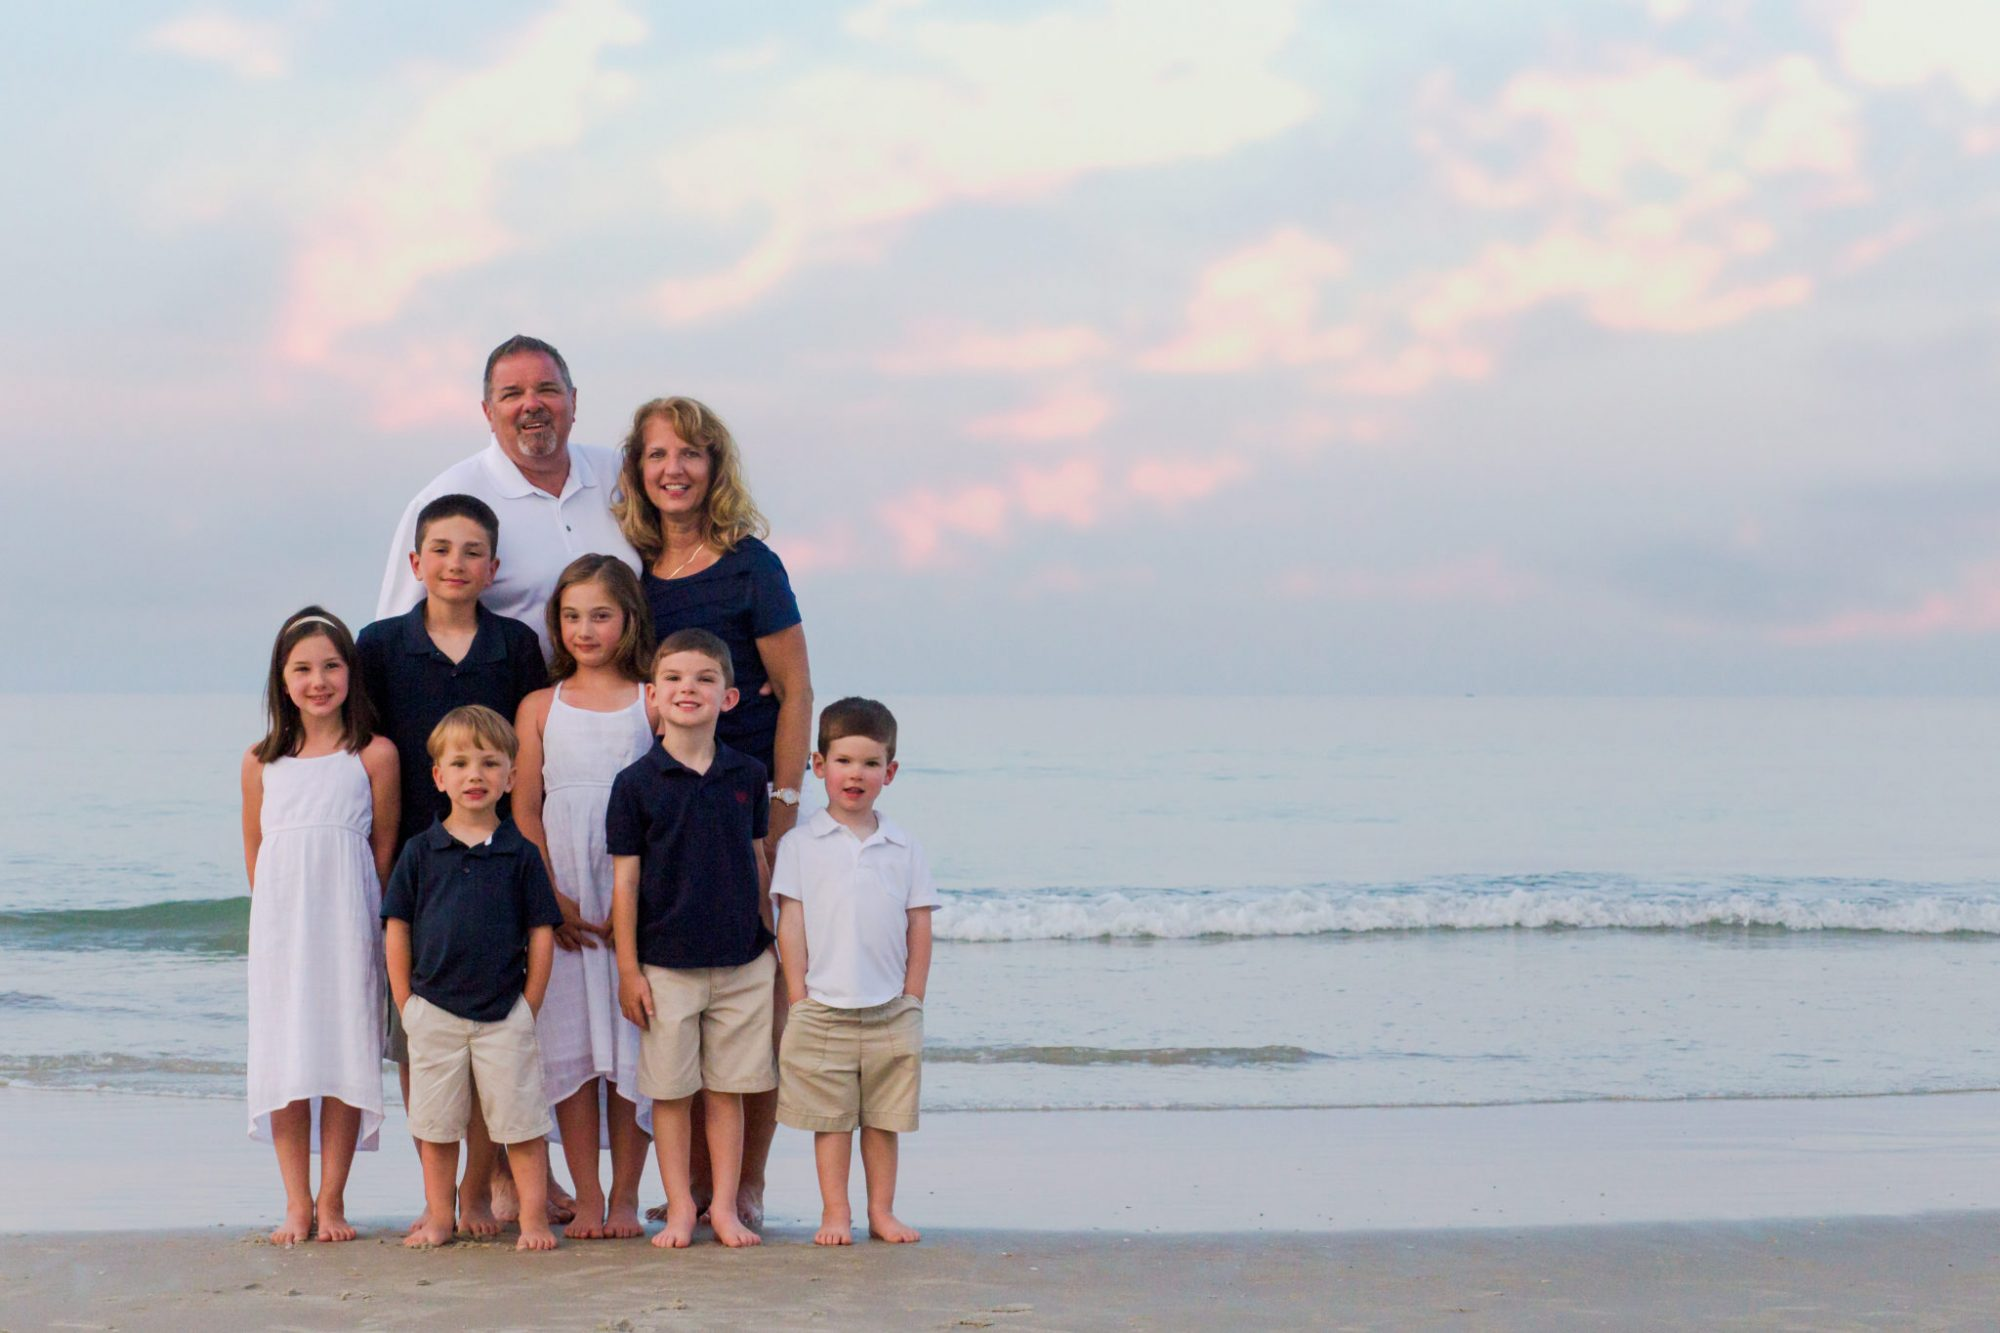 Lighthouse point park, deltona photographer, deland photographer, st augustine photographer, ormond beach photographer, port orange family photographer